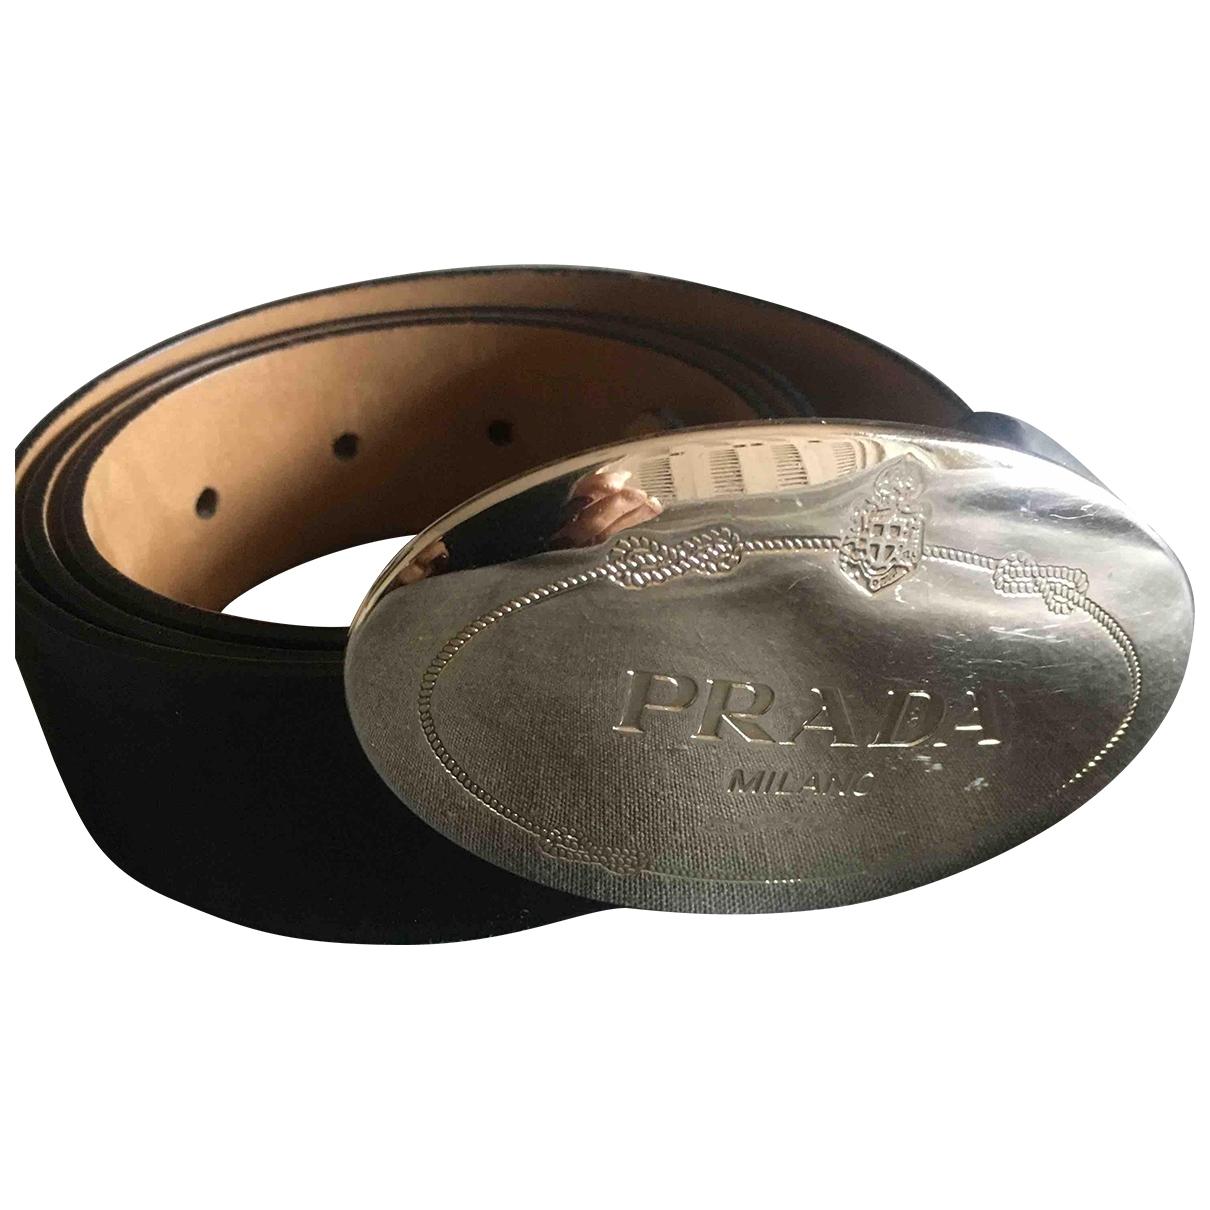 Prada \N Black Leather belt for Women XS International